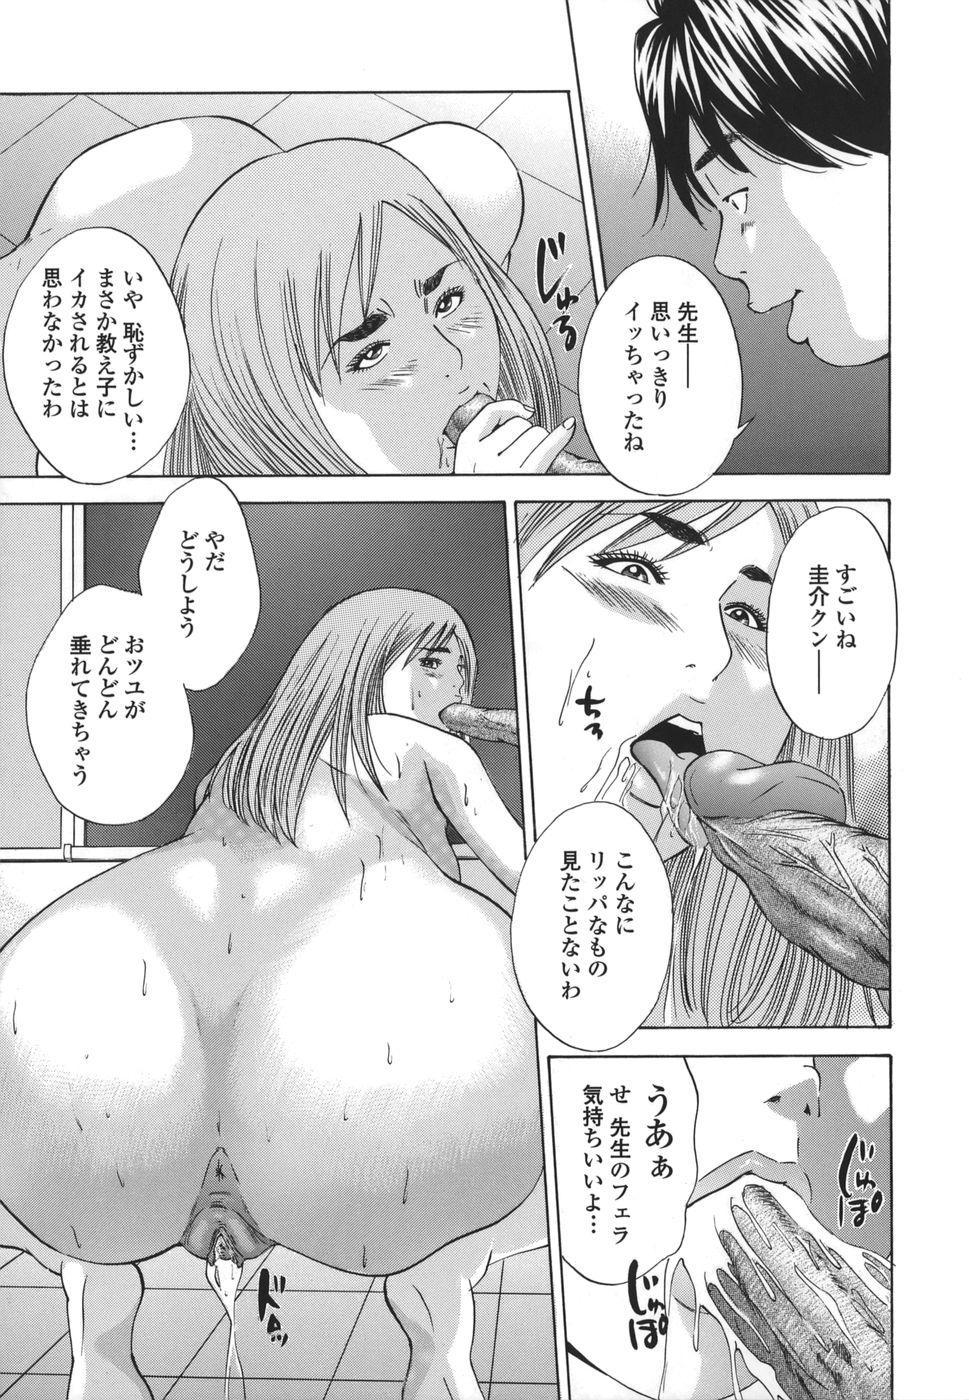 Kinshin Goukan - Near Relation Rapes 178